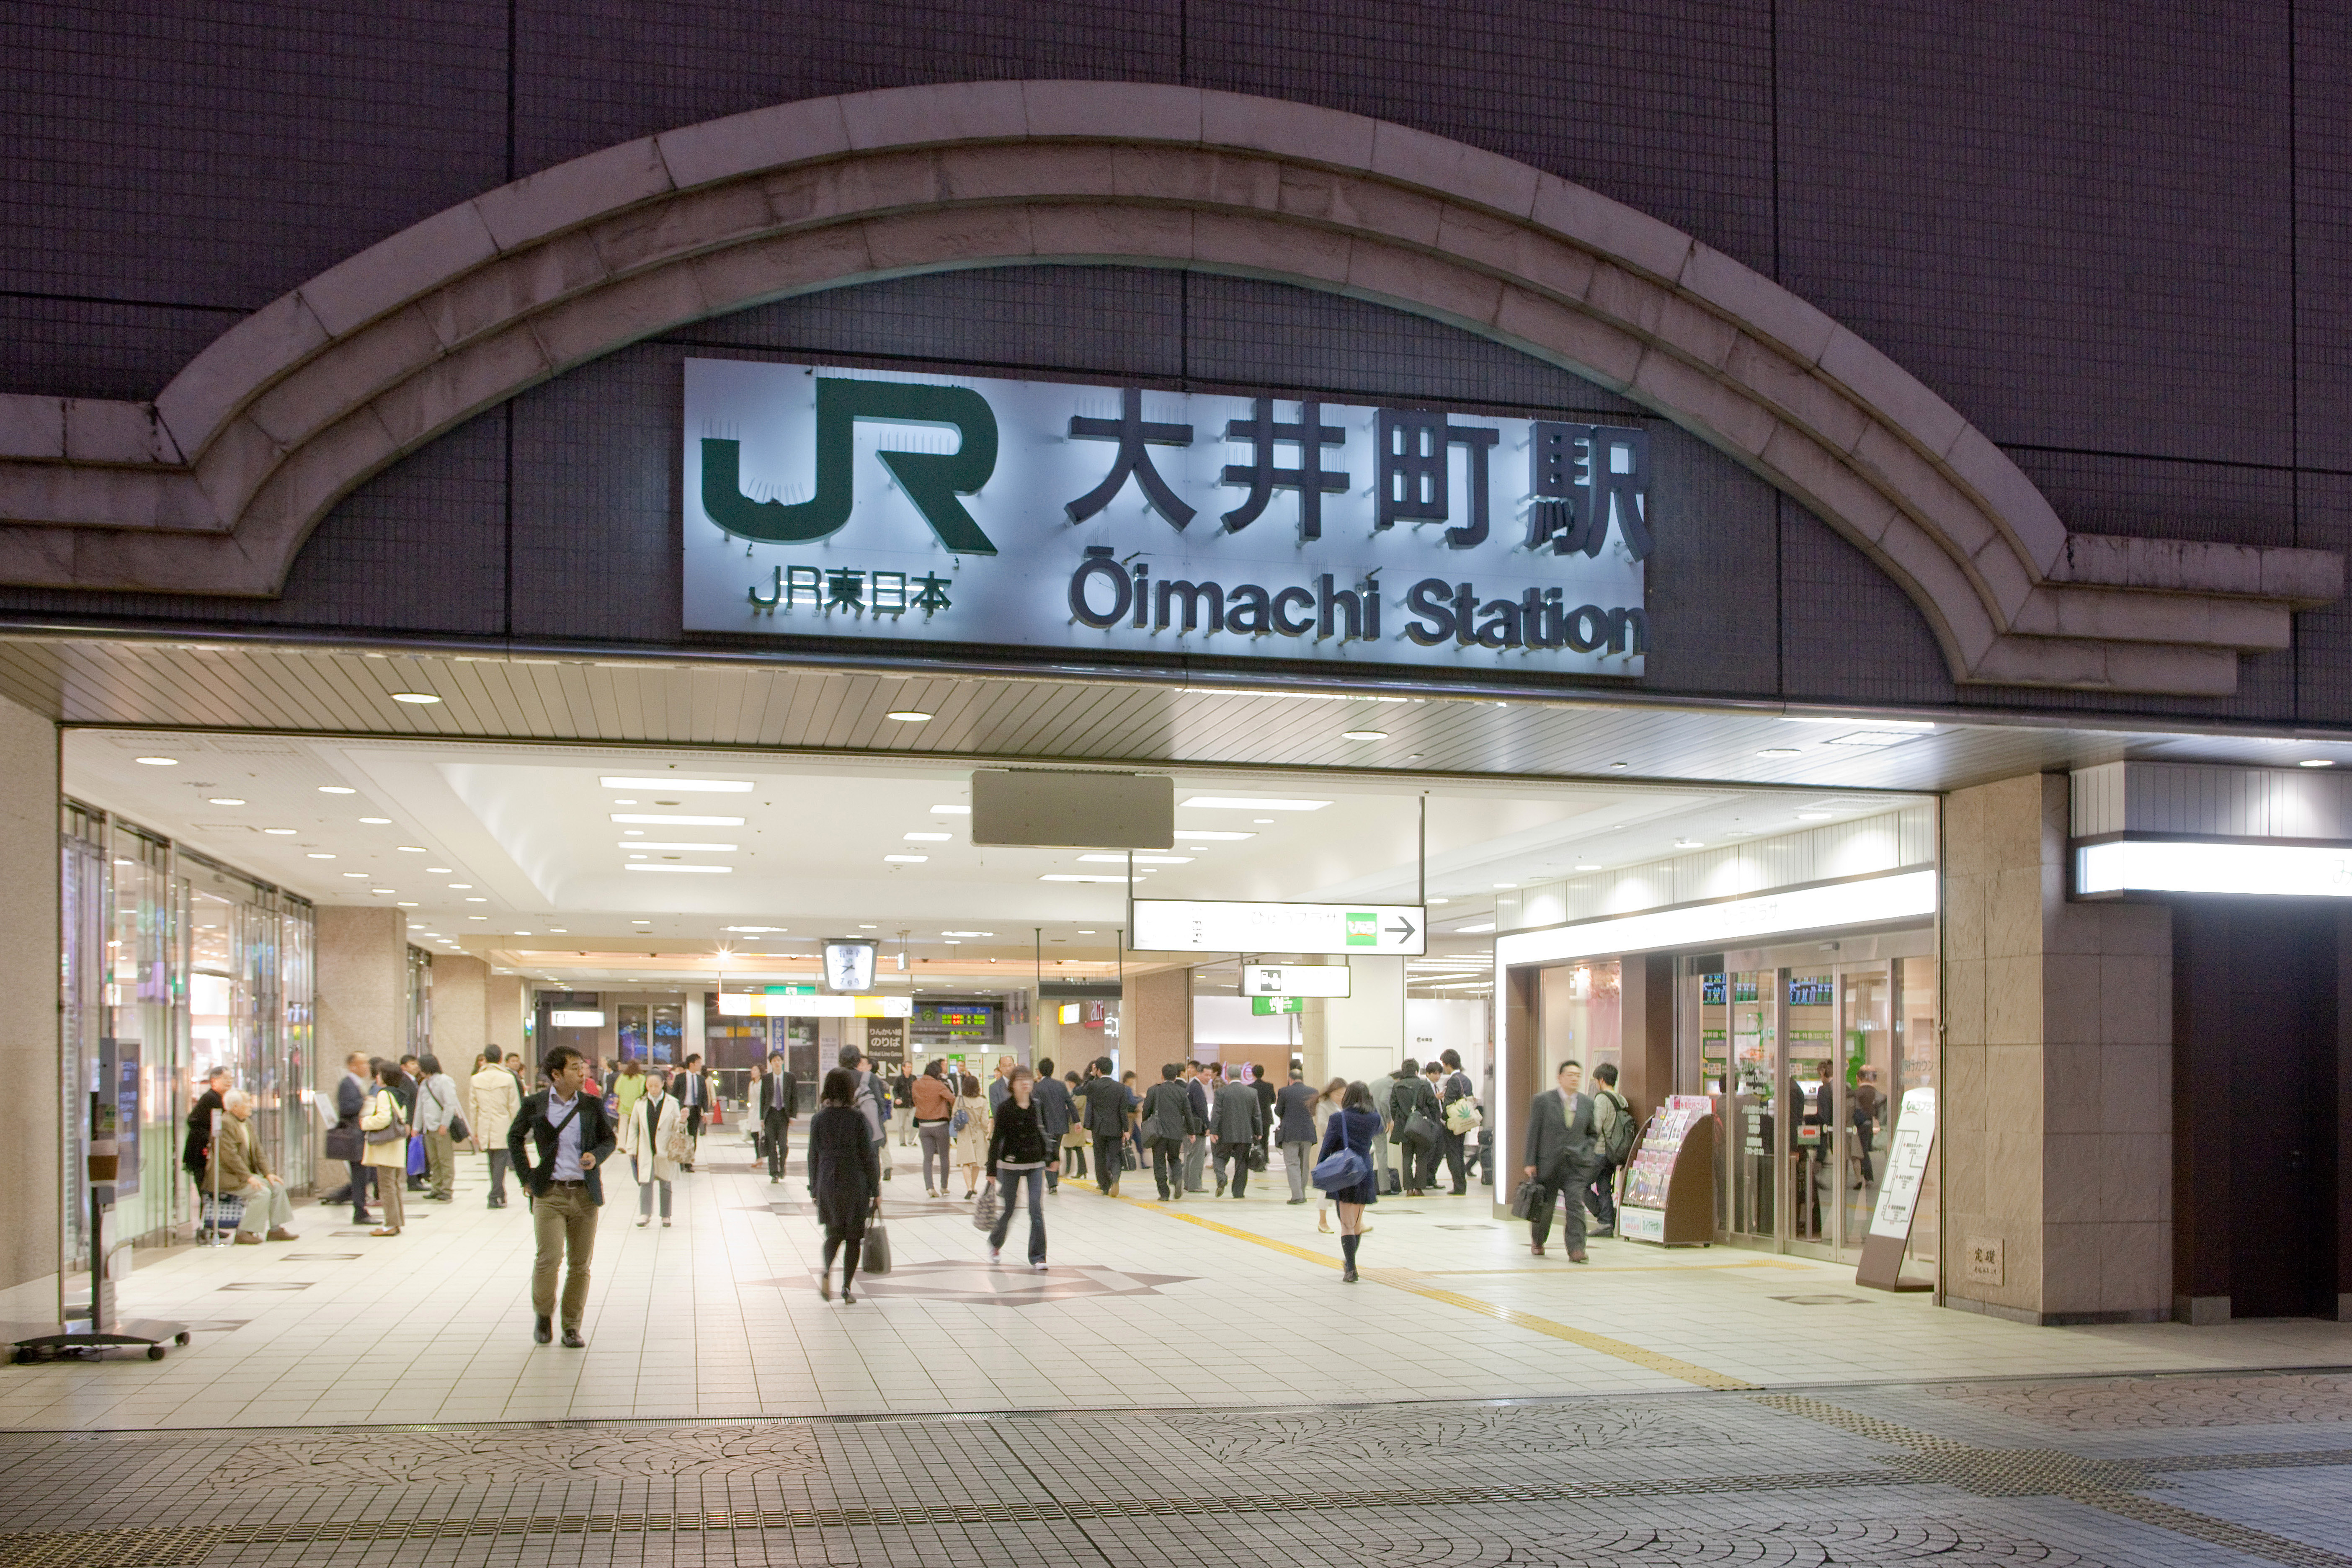 JR大井町駅ビルにある、潜れるショップ